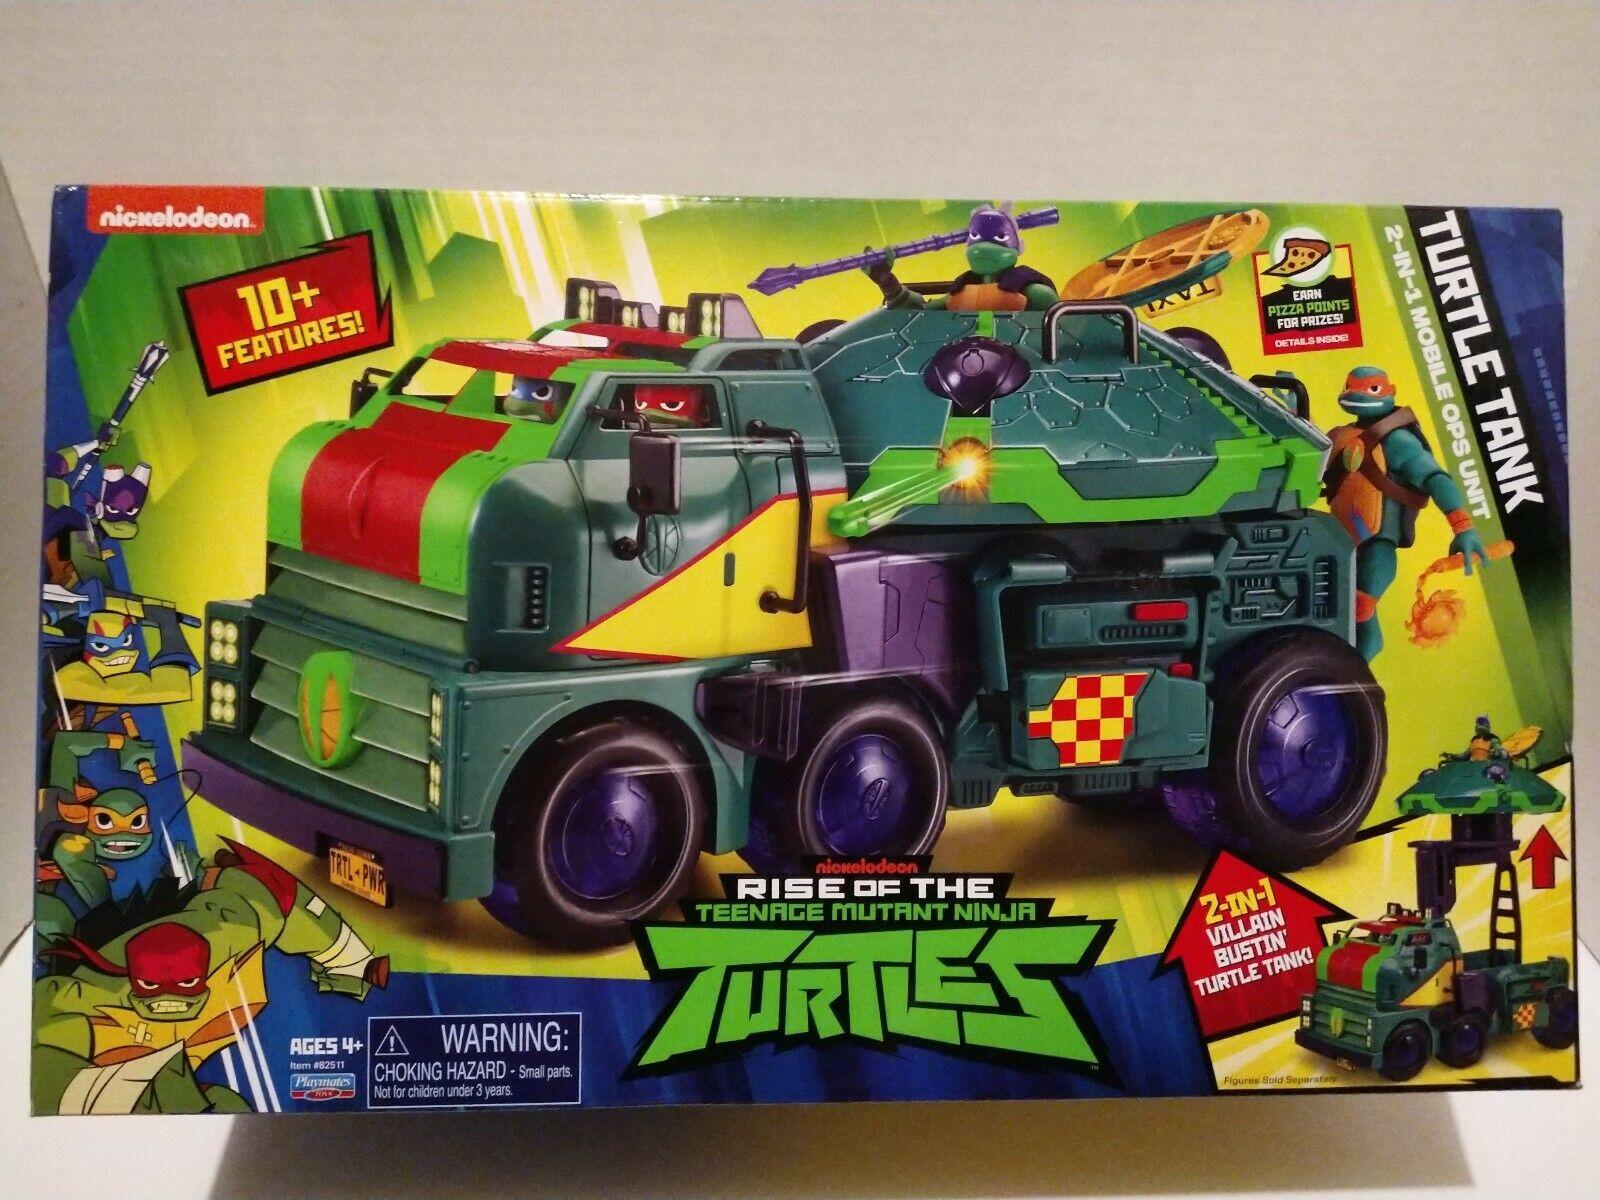 PLAYMATES RISE OF Teenage Mutant Ninja  Turtles Deluxe TANK VEHICLE nuovo   consegna diretta e rapida in fabbrica